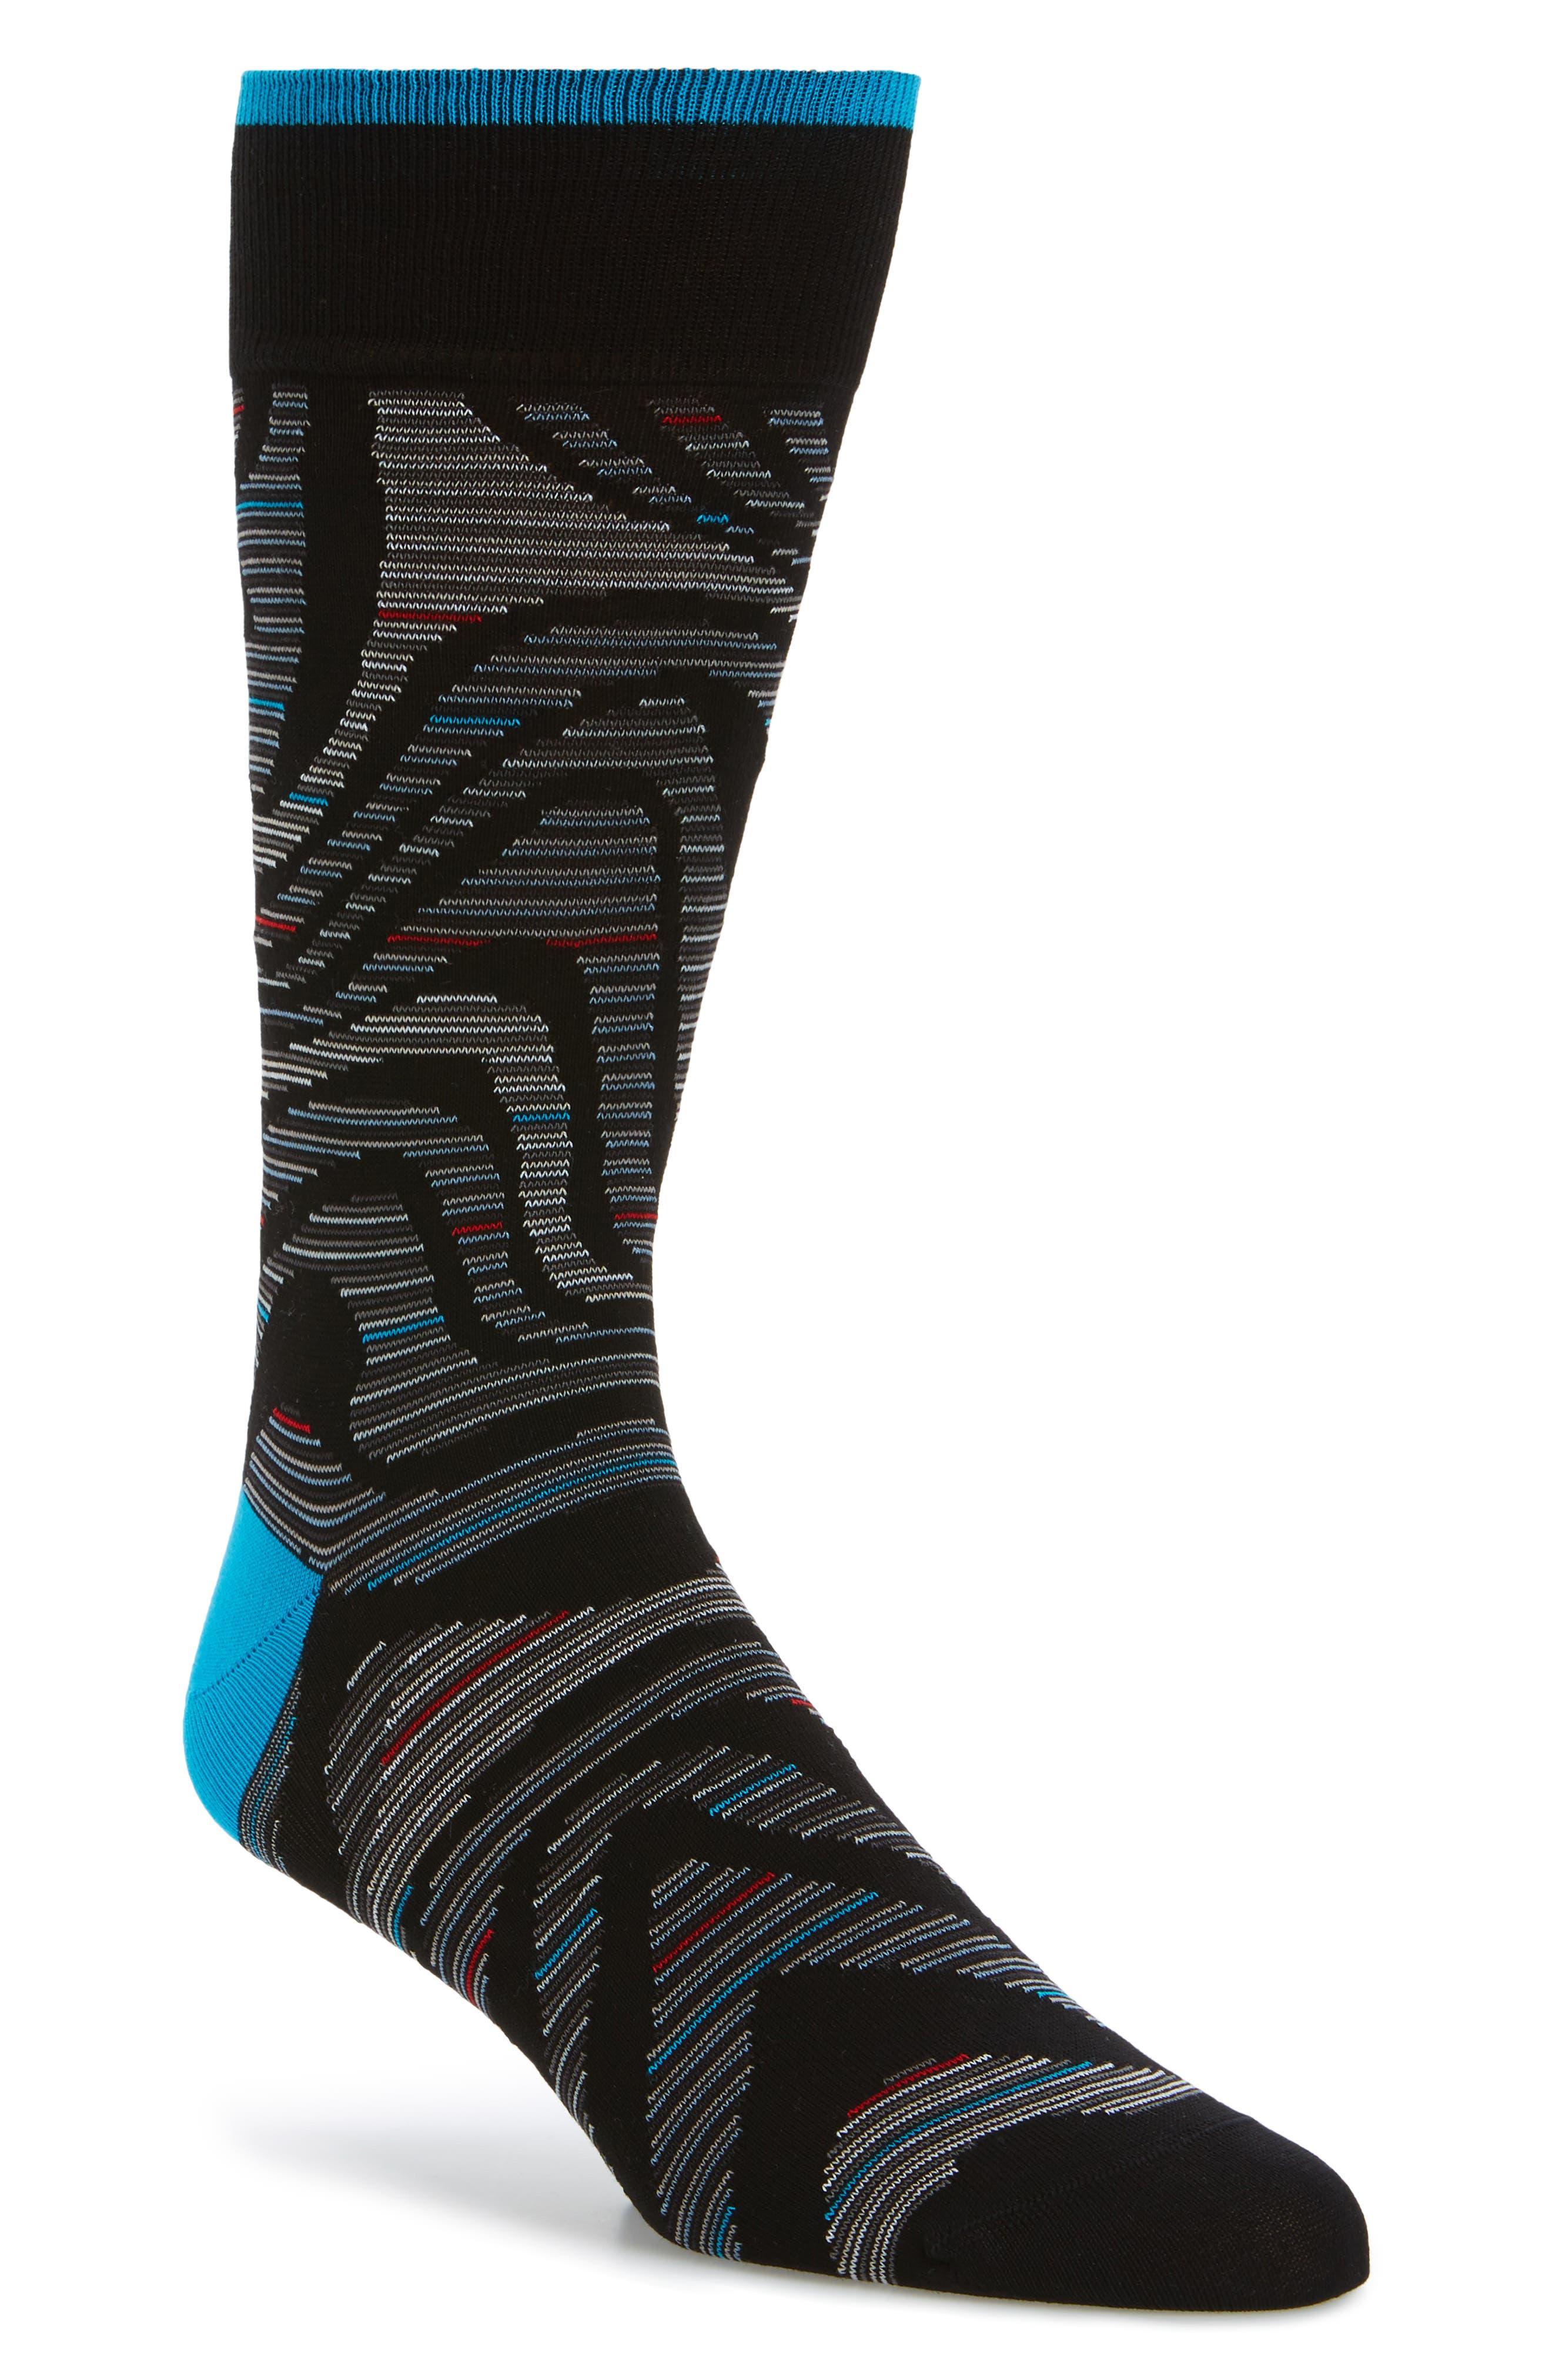 Pattern Socks,                         Main,                         color, Black